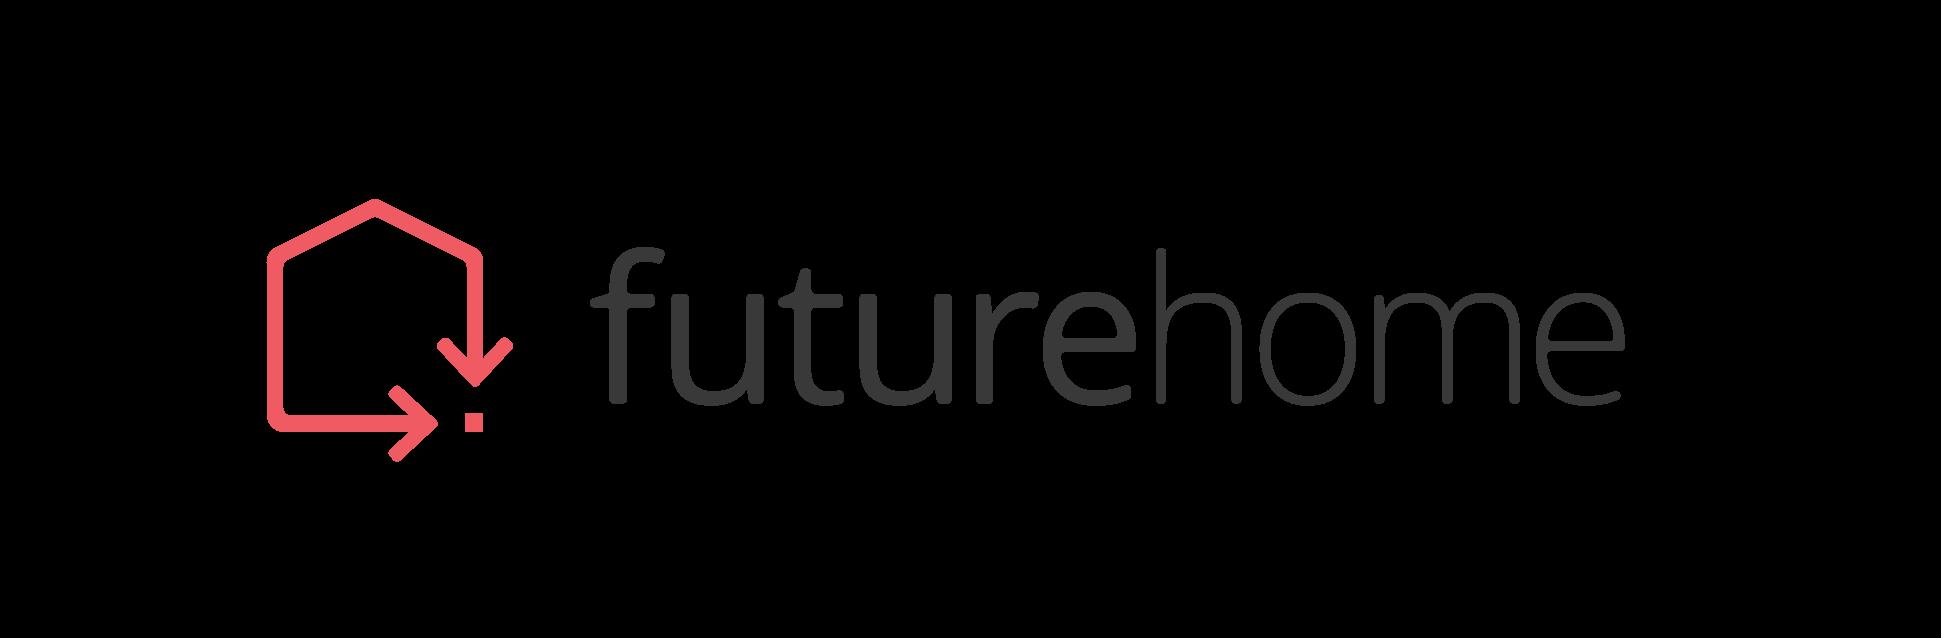 Futurehome